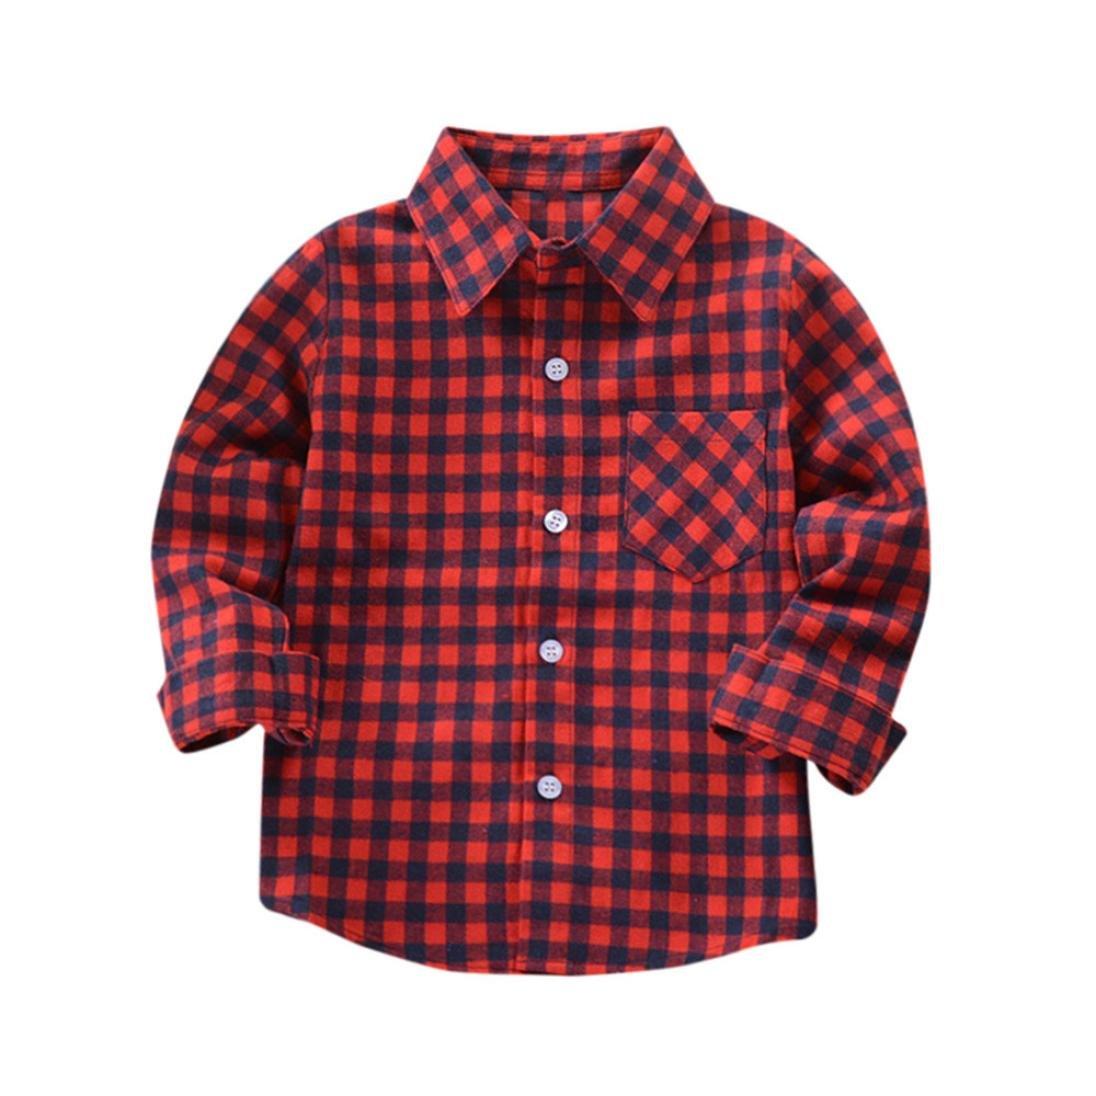 Huhu833 Kinder Jungen Mädchen Langarm Baumwolle Shirt Karos Tops Bluse Kleidung Outfits